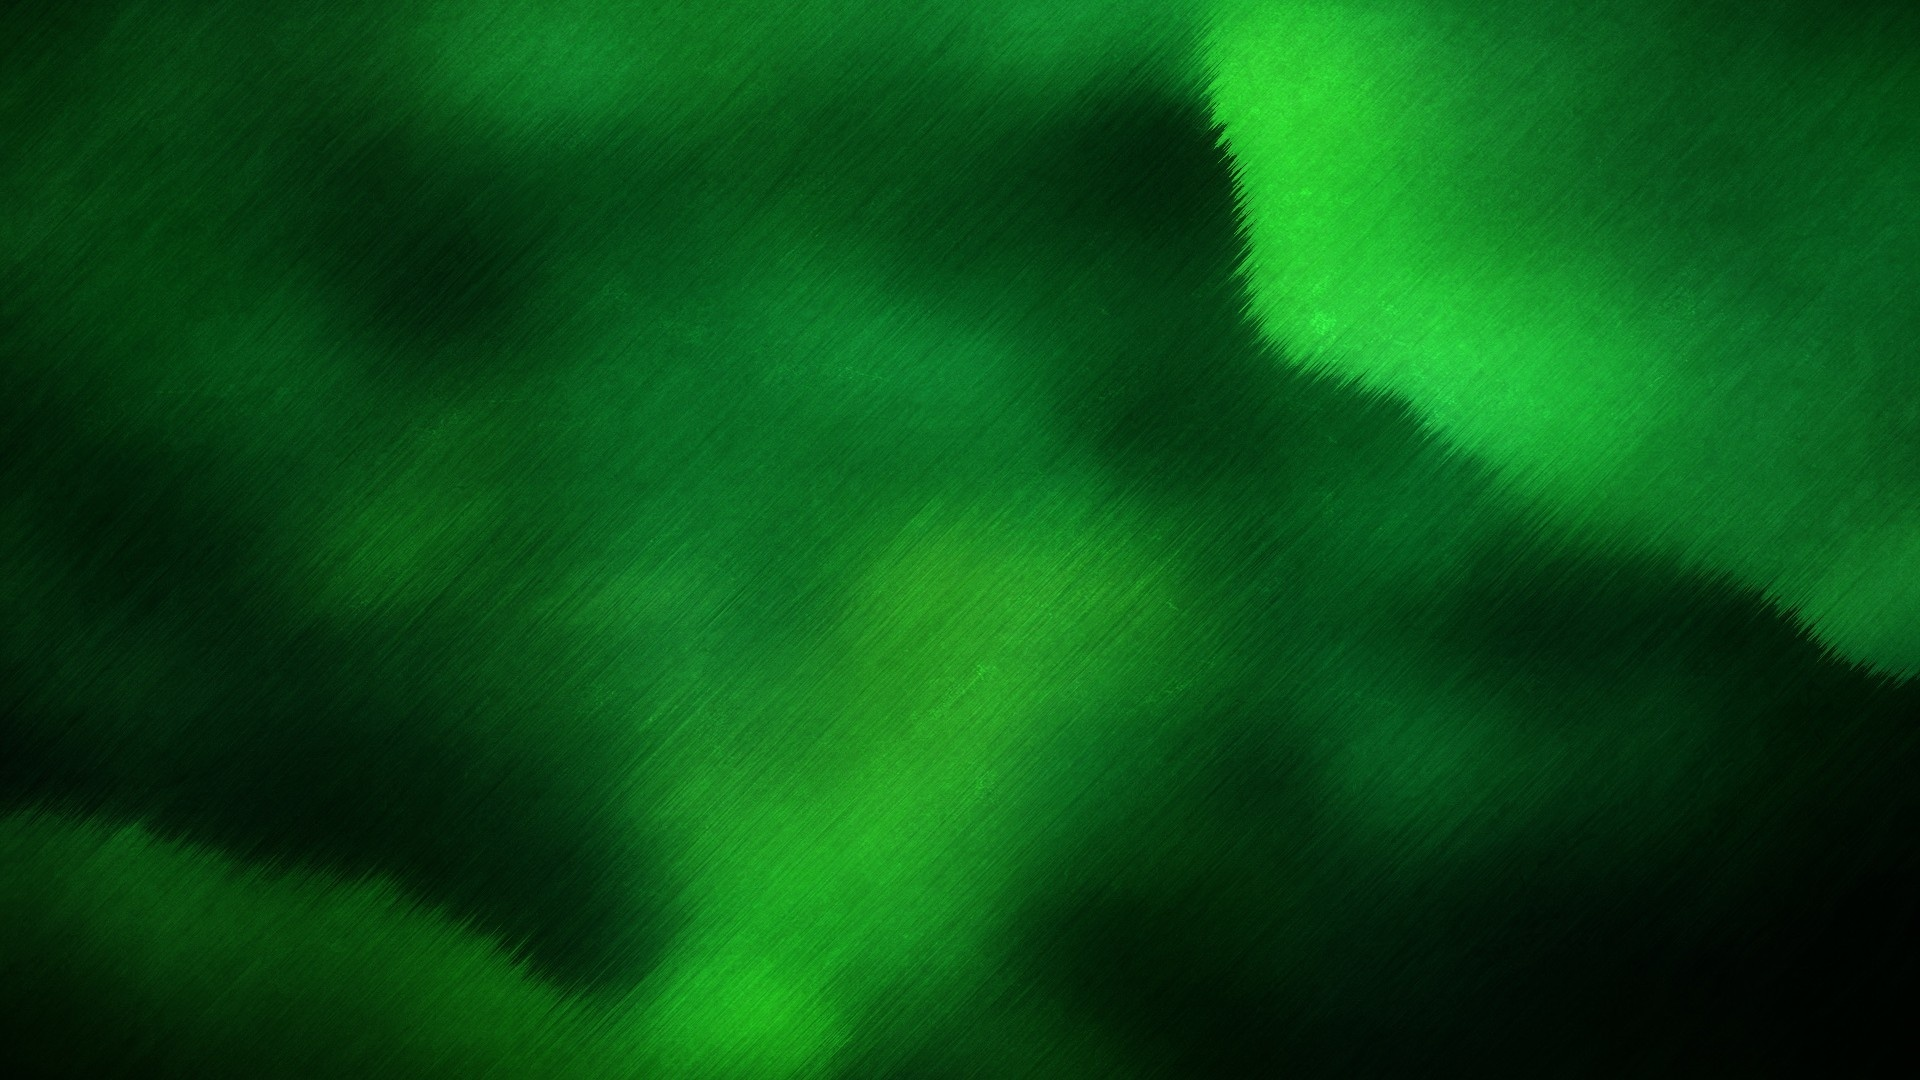 Black And Green computer wallpaper